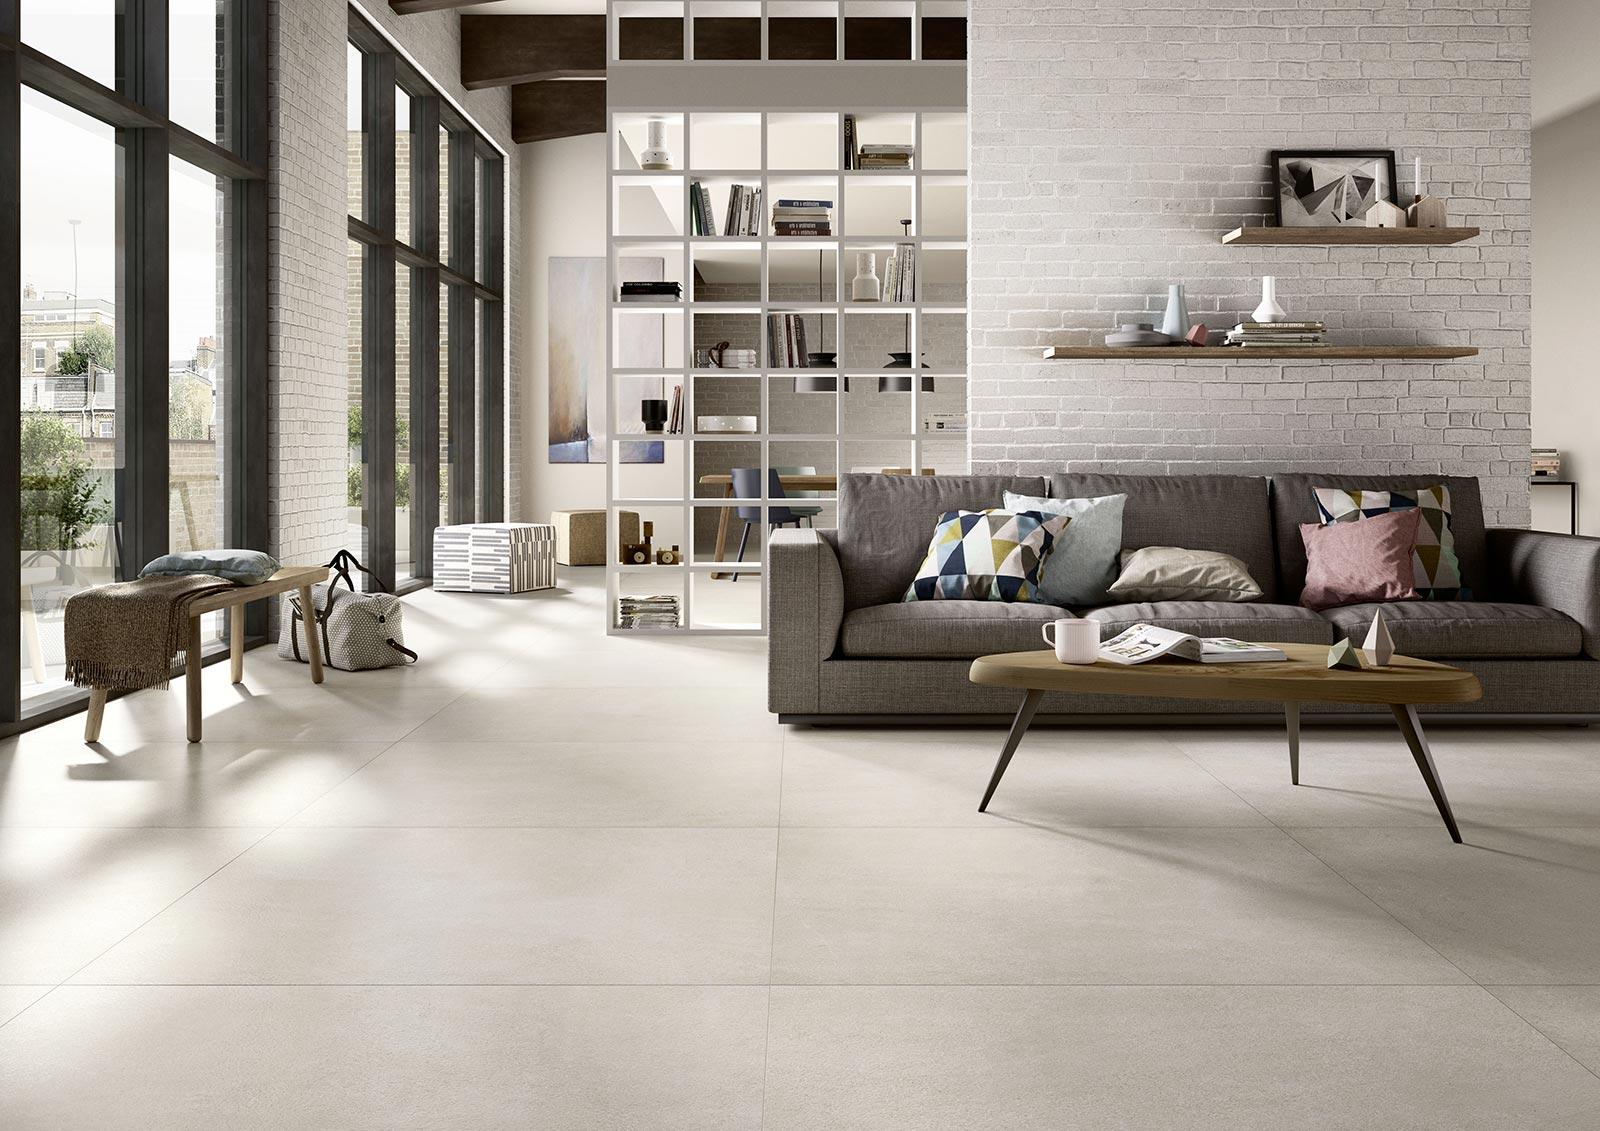 Tile Designs For Living Room Floors Living Room Floor Inspiration For Your Furniture Marazzi